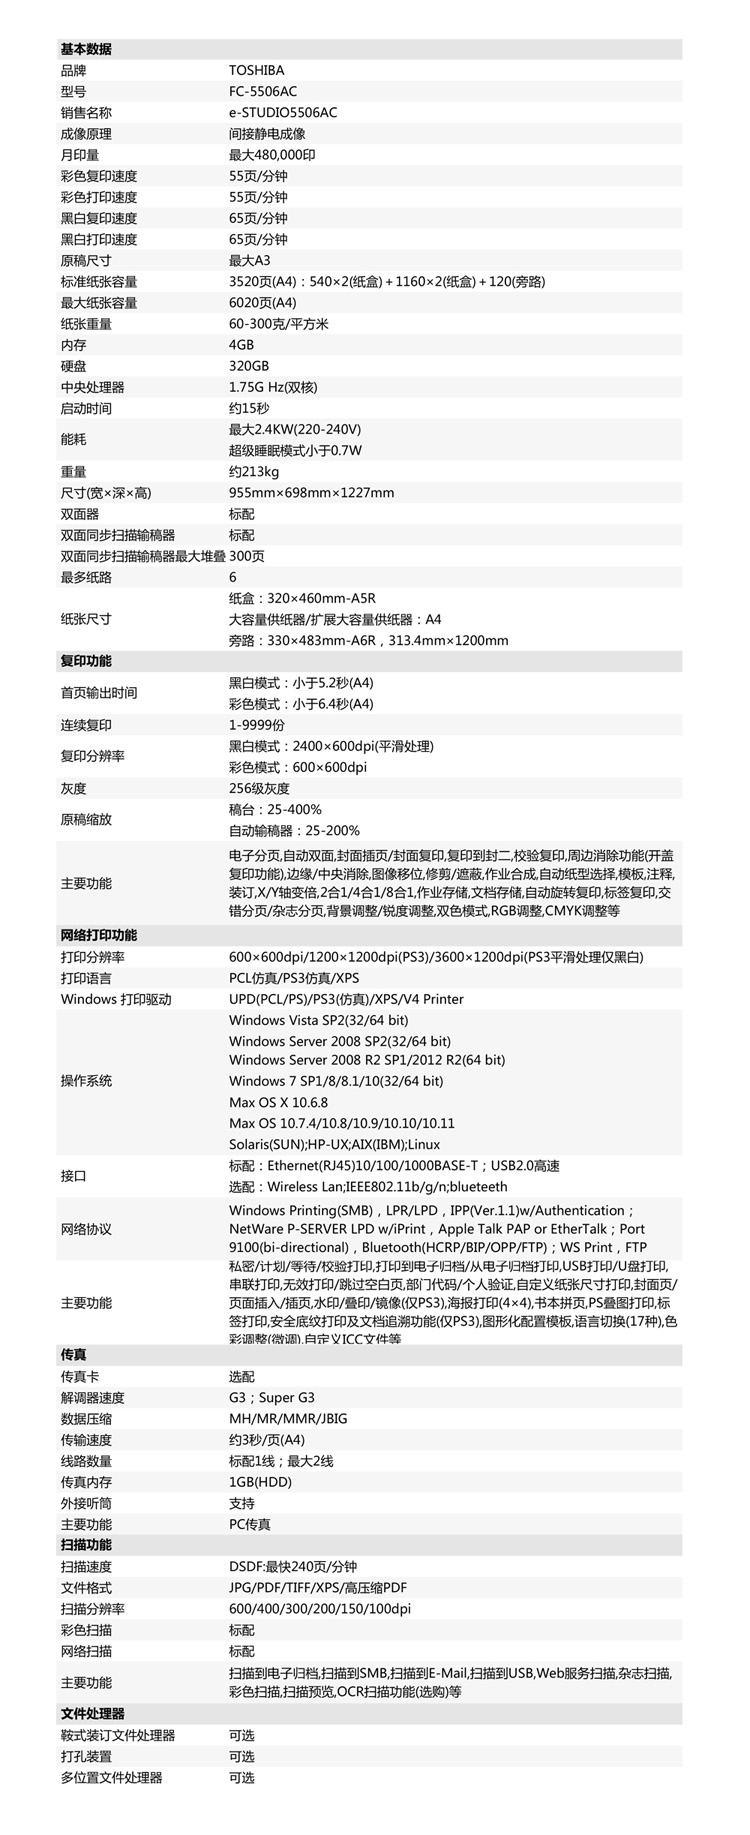 e-STUDIO5506AC.jpg